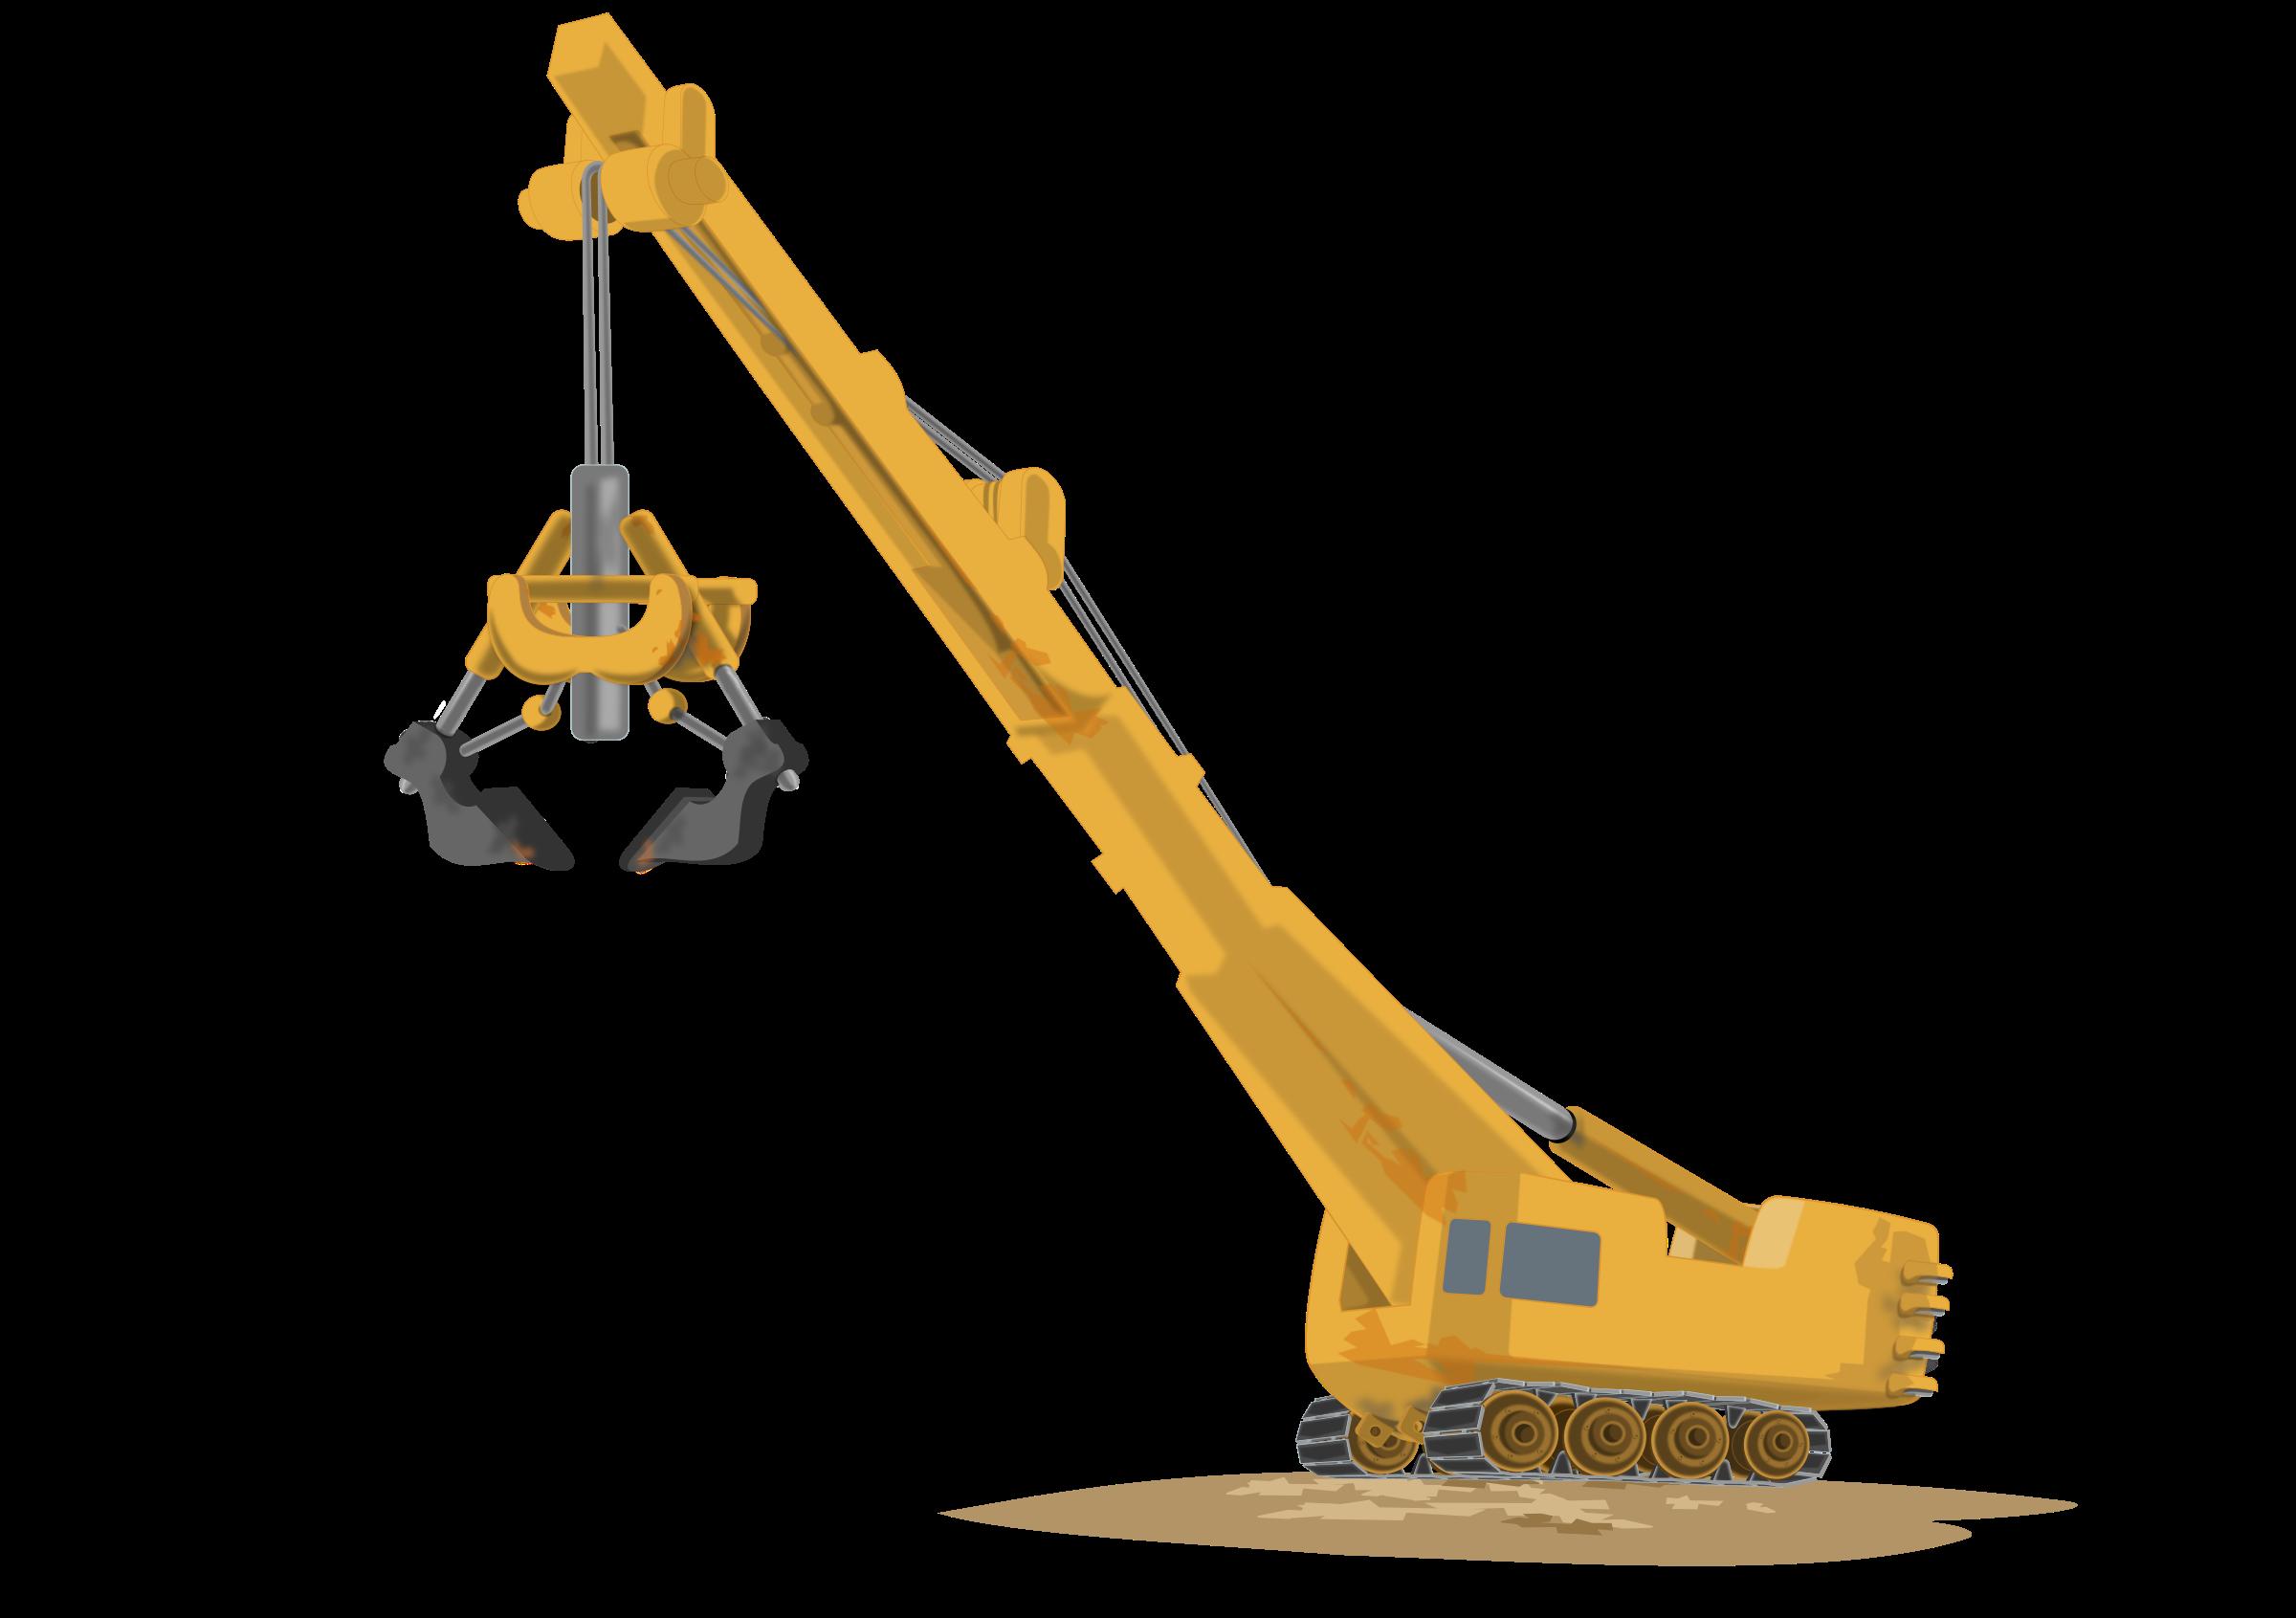 Machine clipart construction crane #6 Crane drawings clipart Download